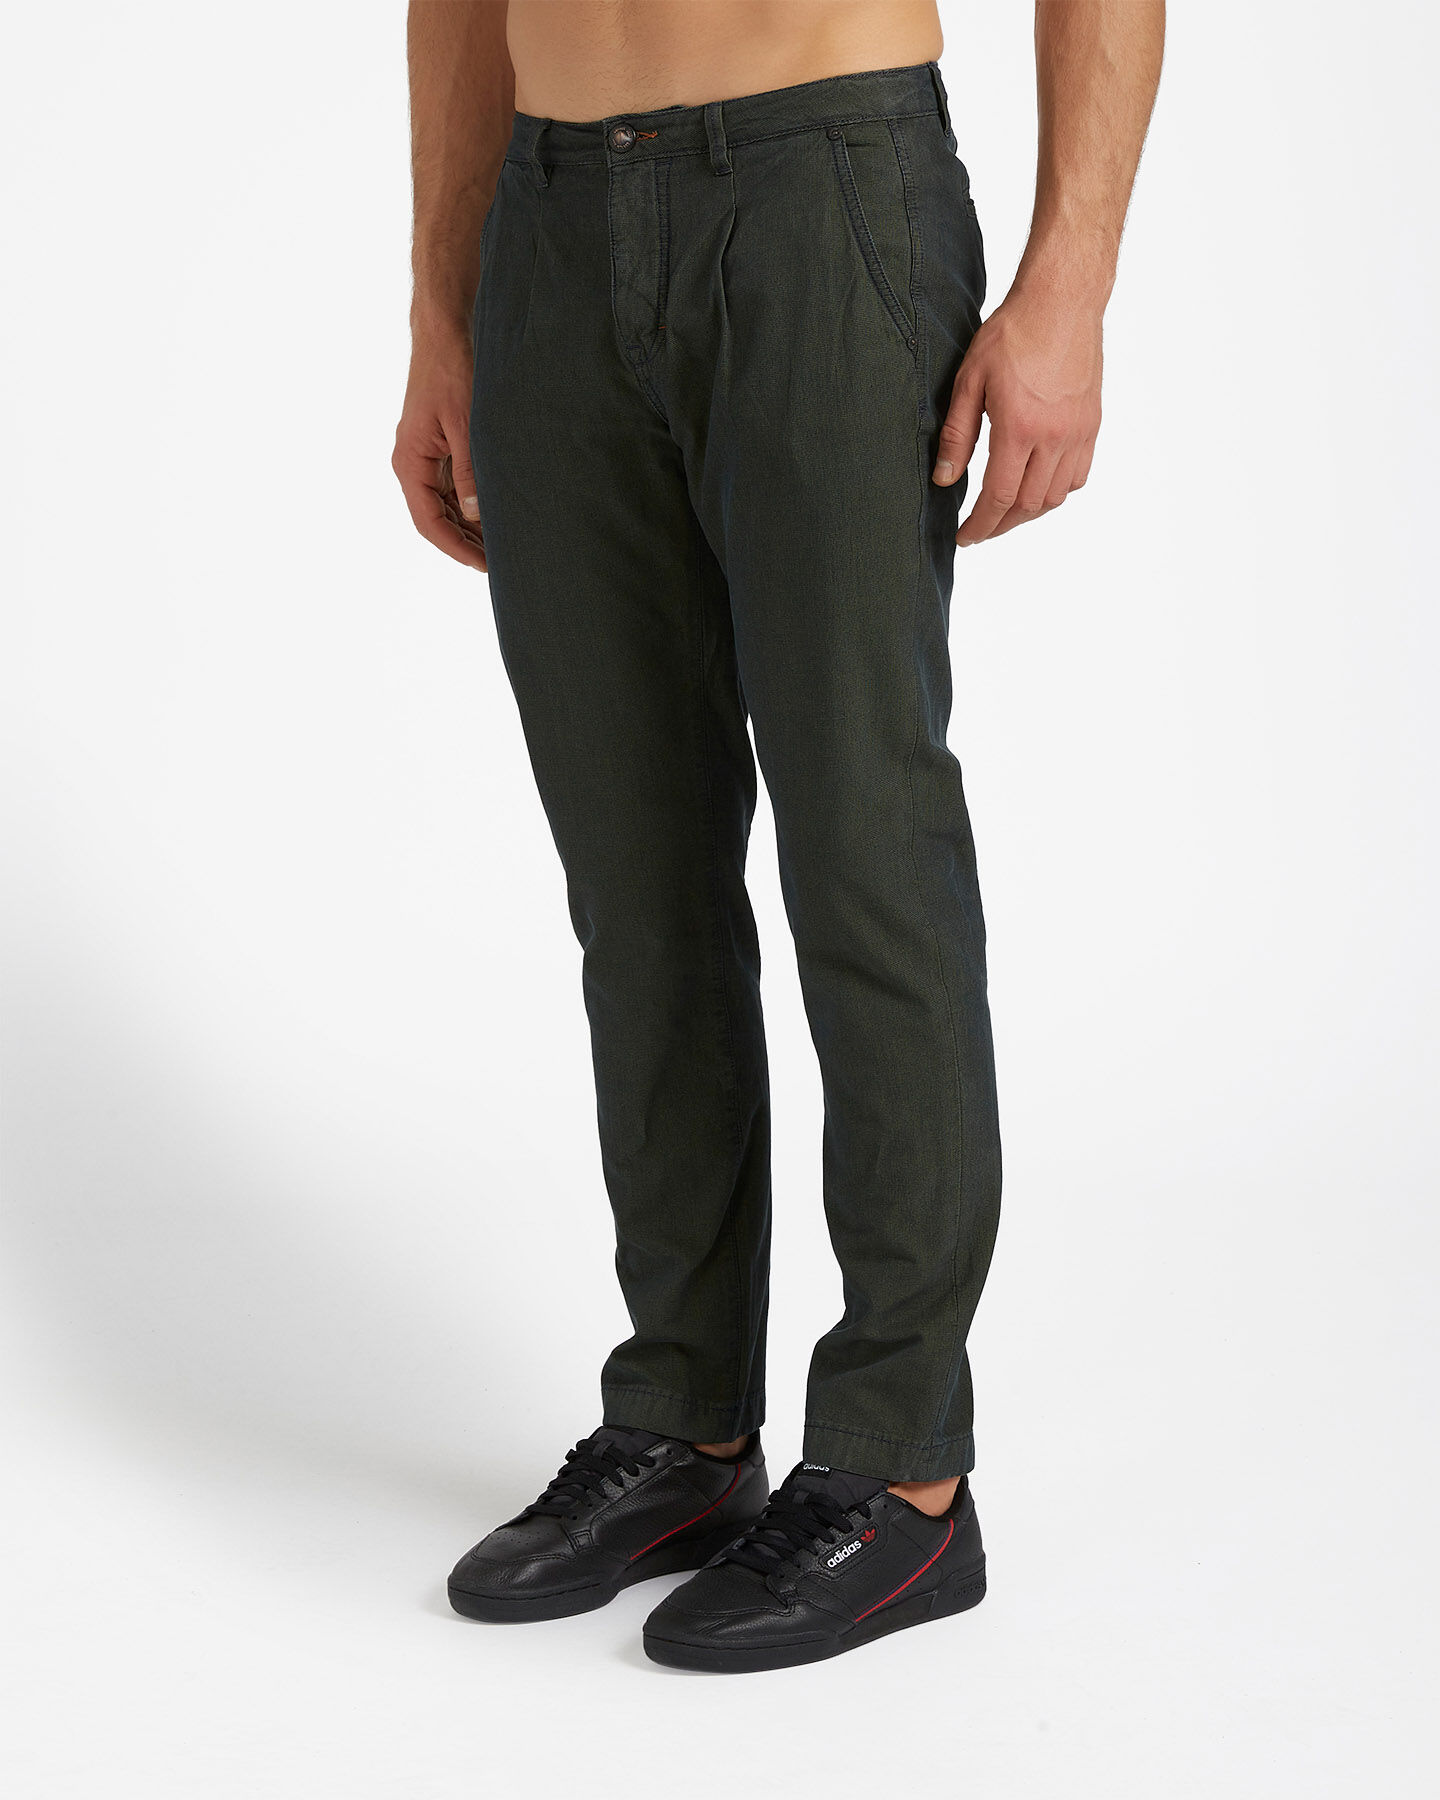 Pantalone COTTON BELT CHINO STRETCH M S4076644 scatto 2